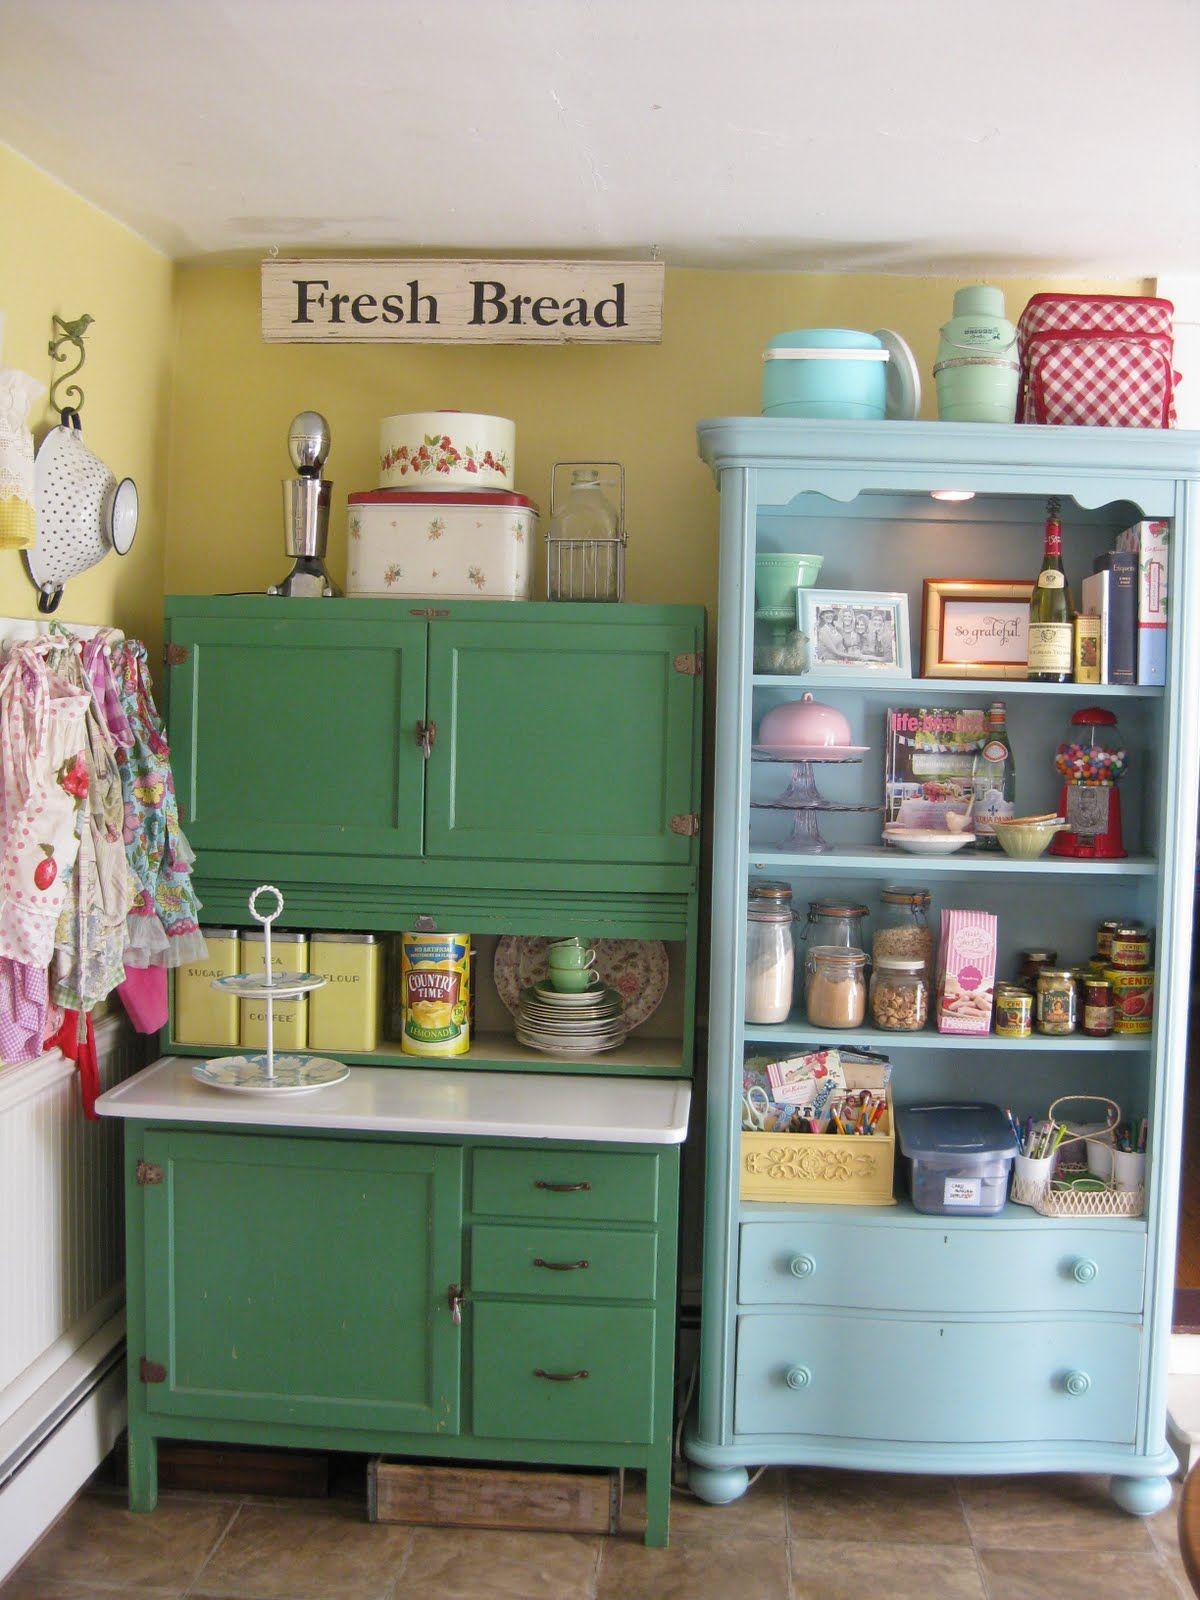 Colorful Vintage Kitchen Storage Ideas Pictures Photos